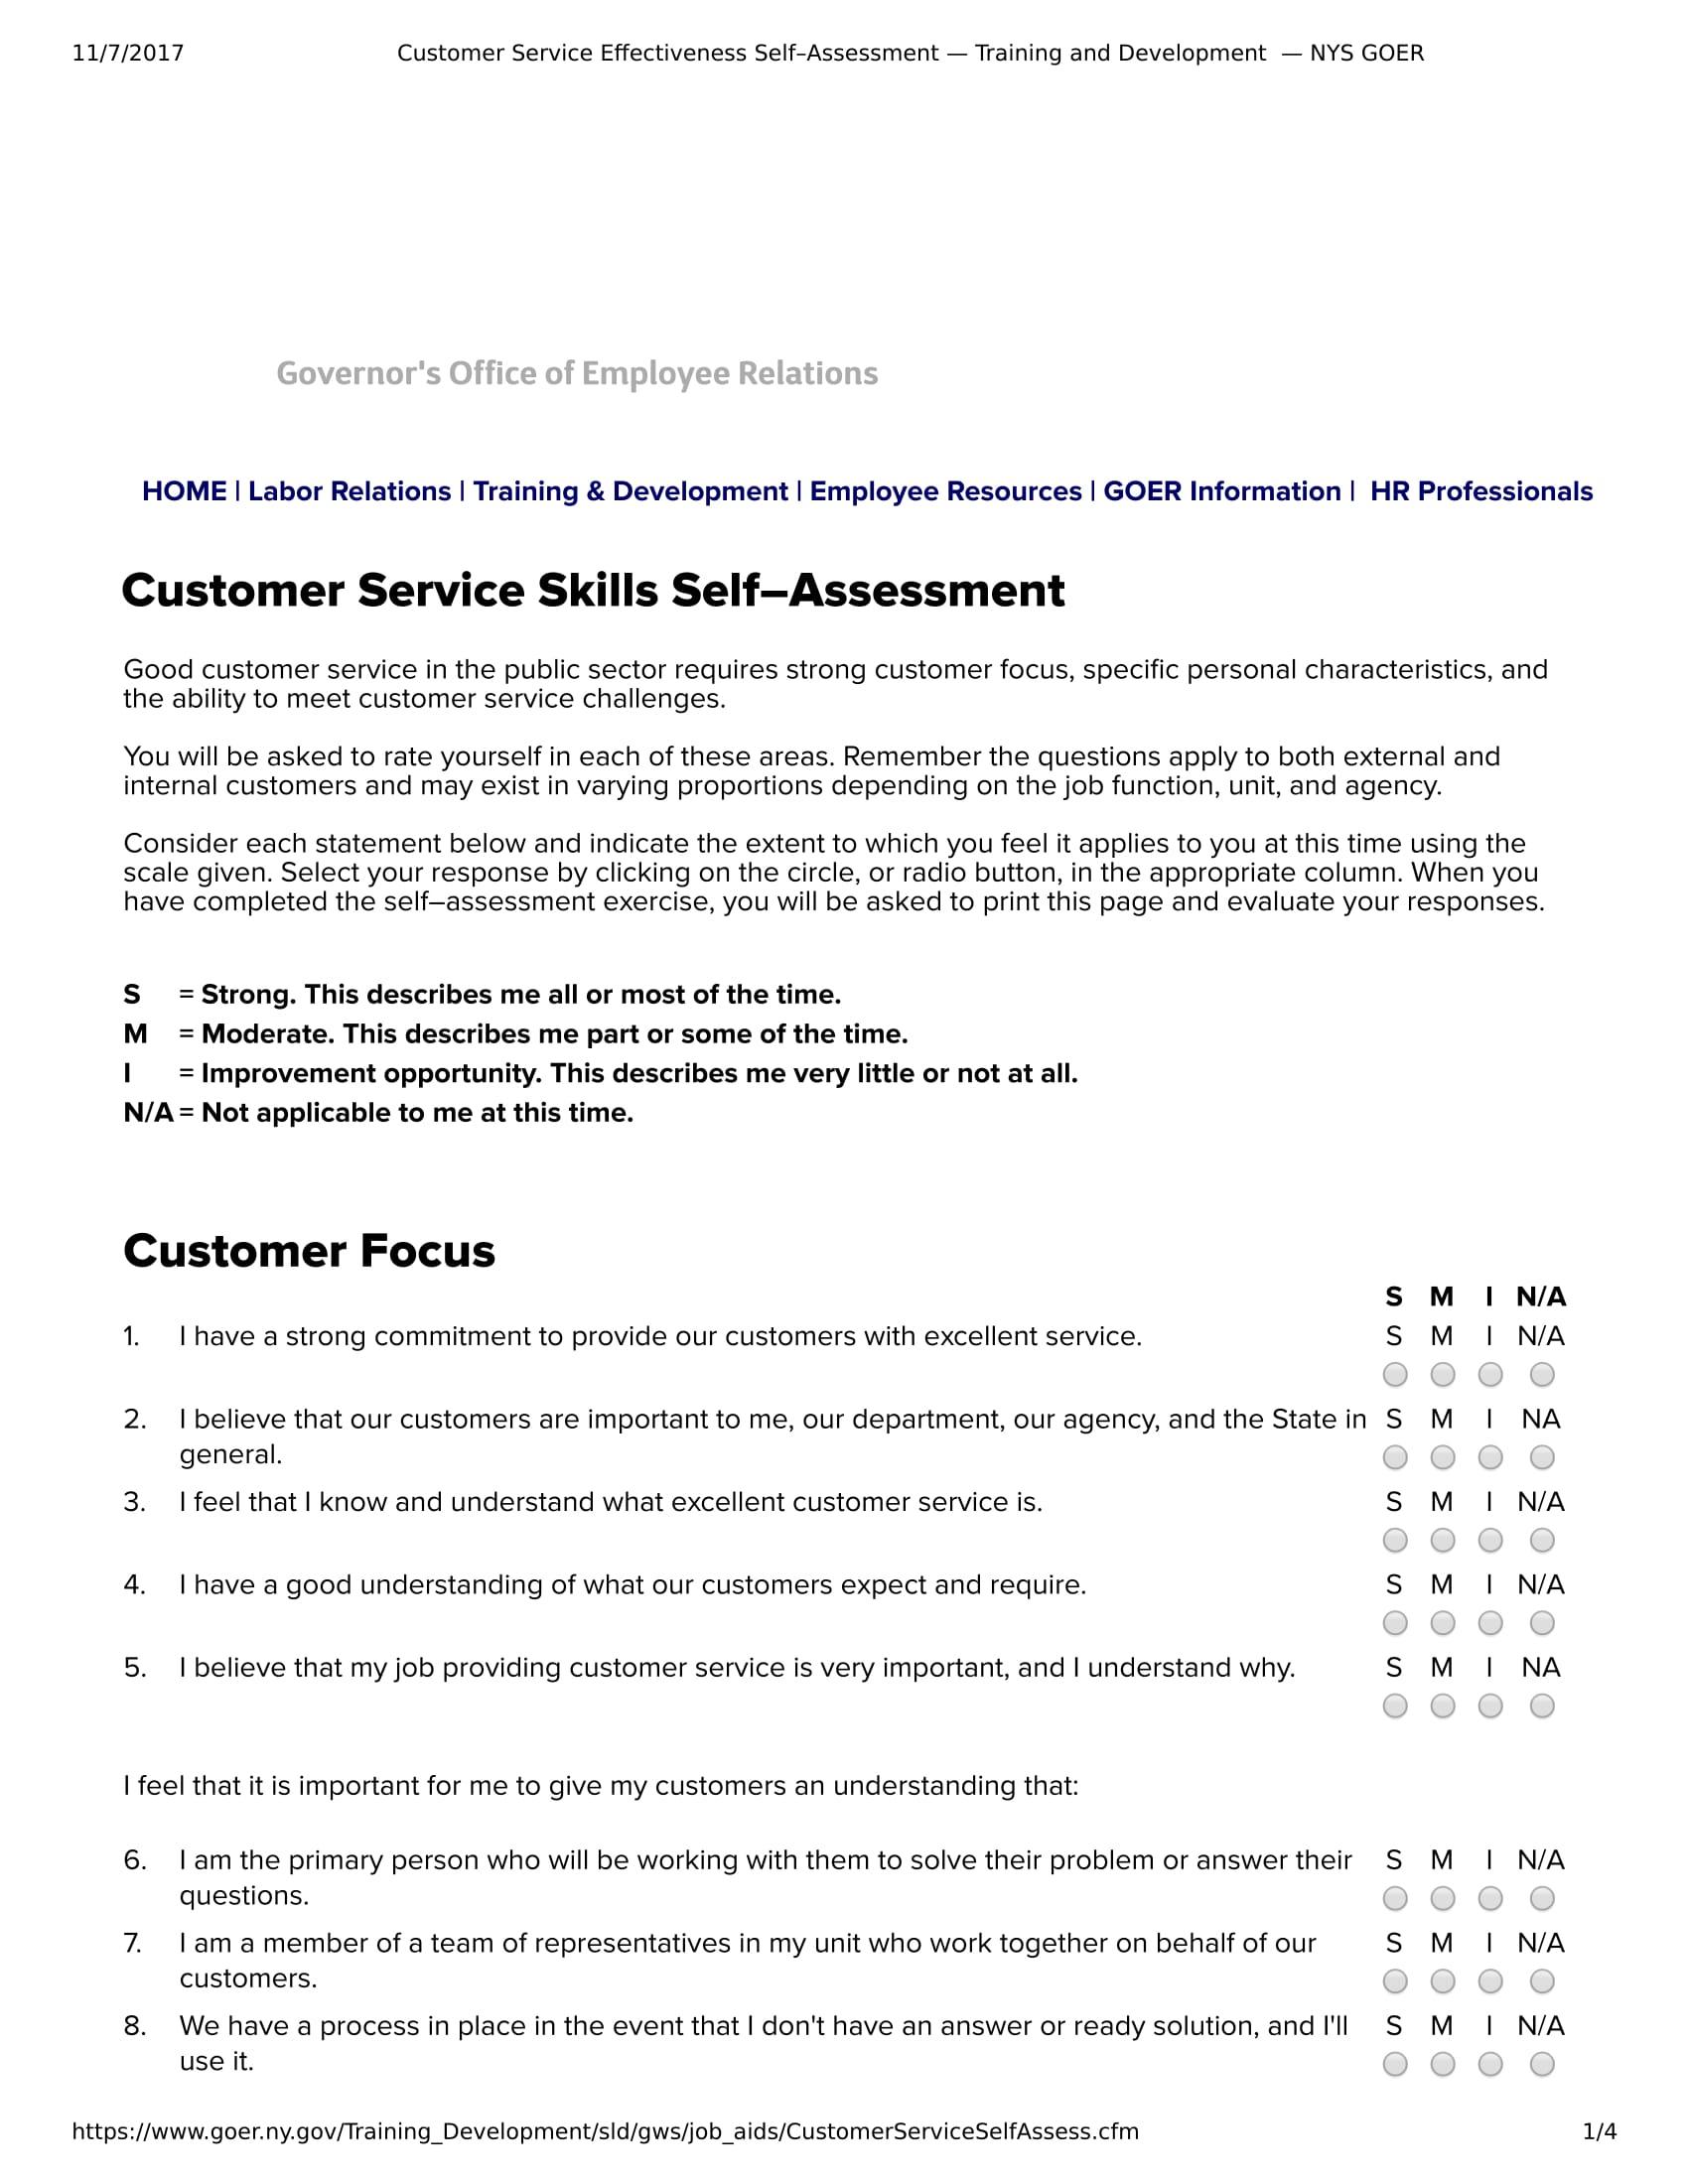 customer service self assessment evaluation form 1